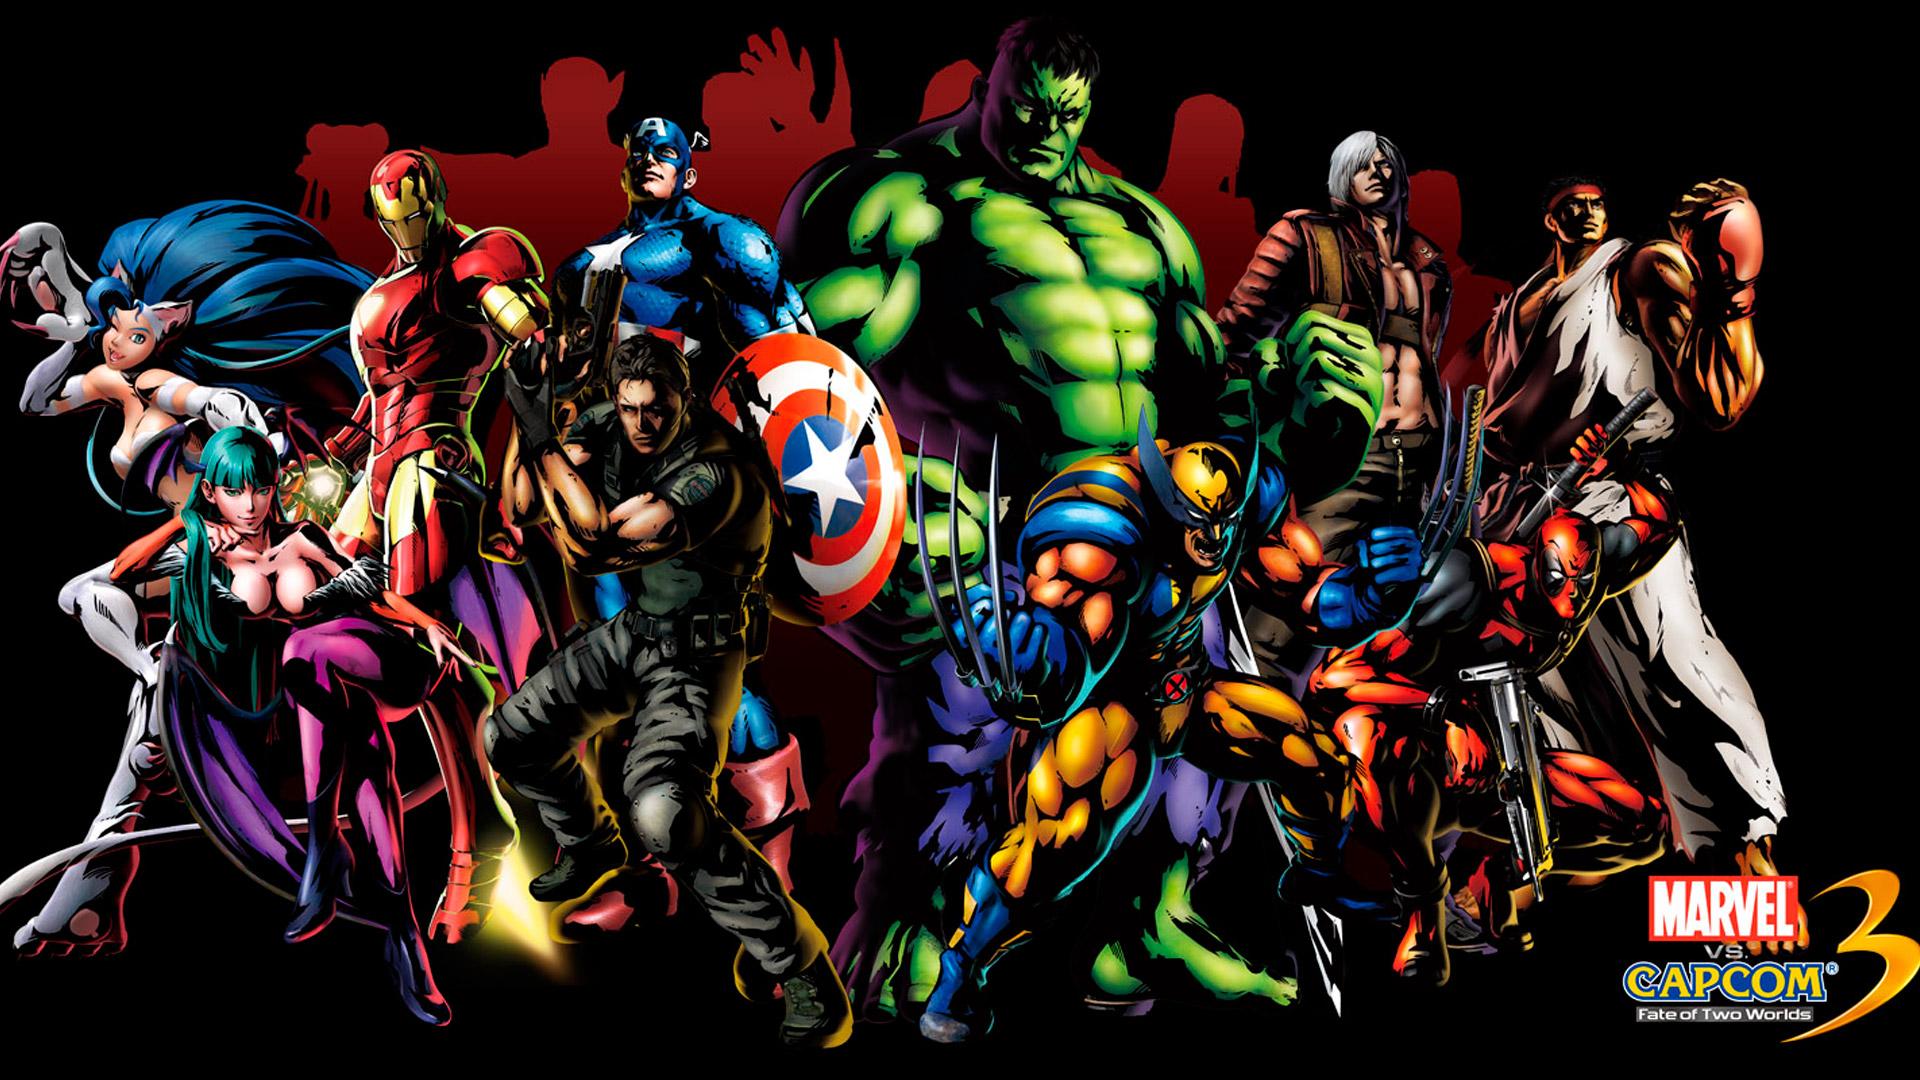 Marvel vs Capcom 3 MVC 3 Wallpapers in HD 1920x1080